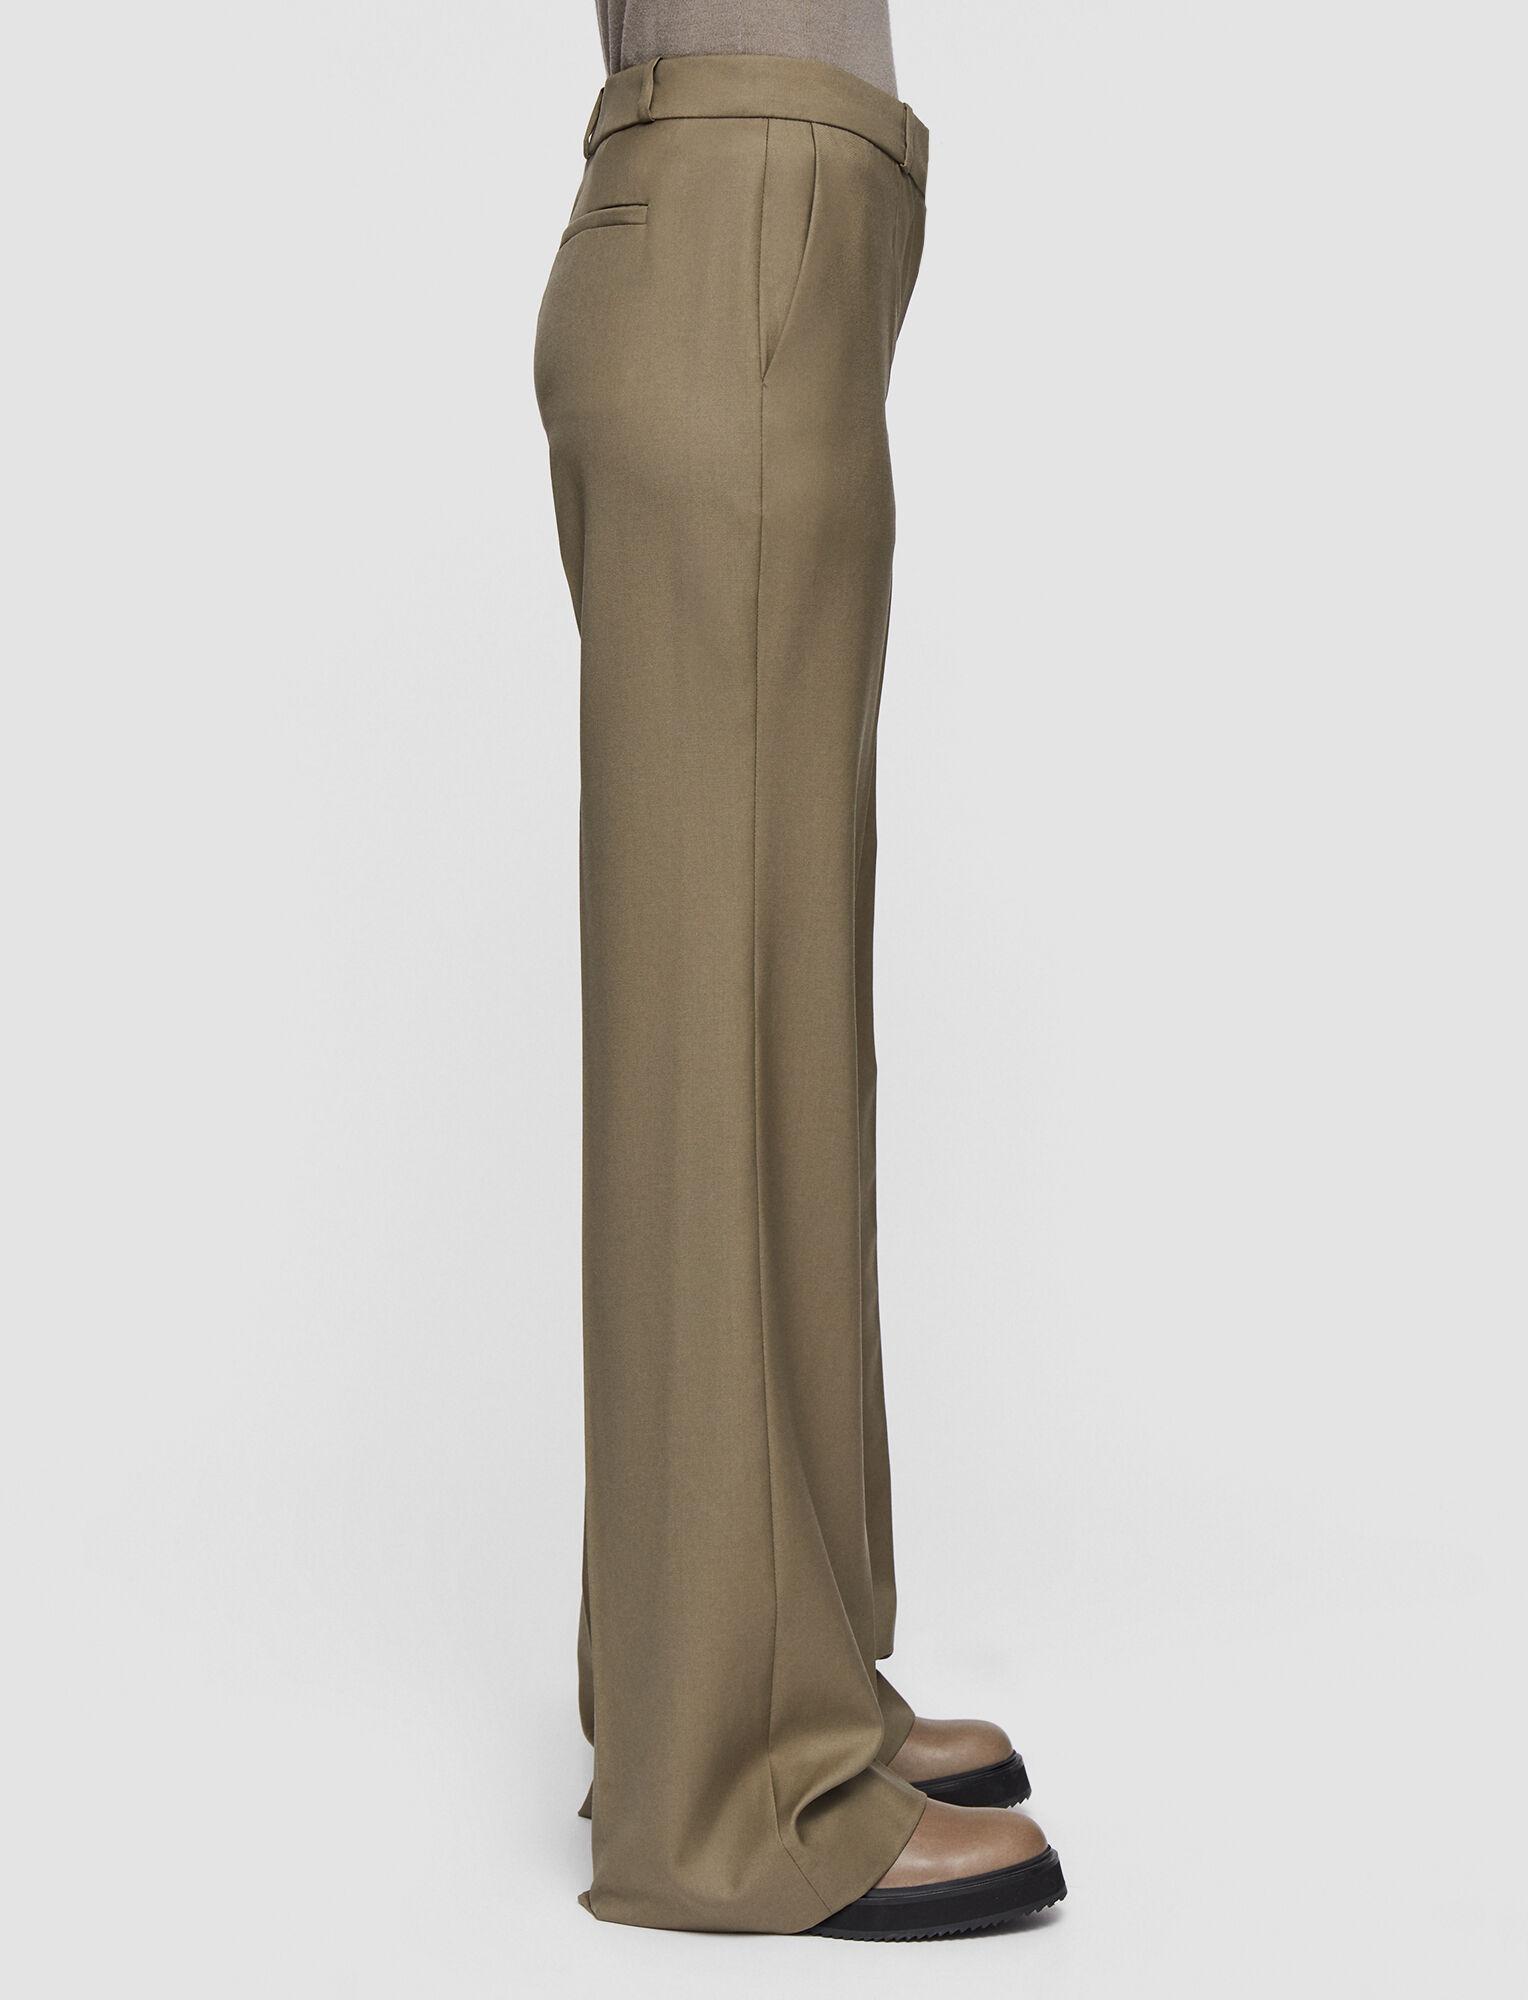 Joseph, Tailoring Wool Morissey Trousers, in ELM